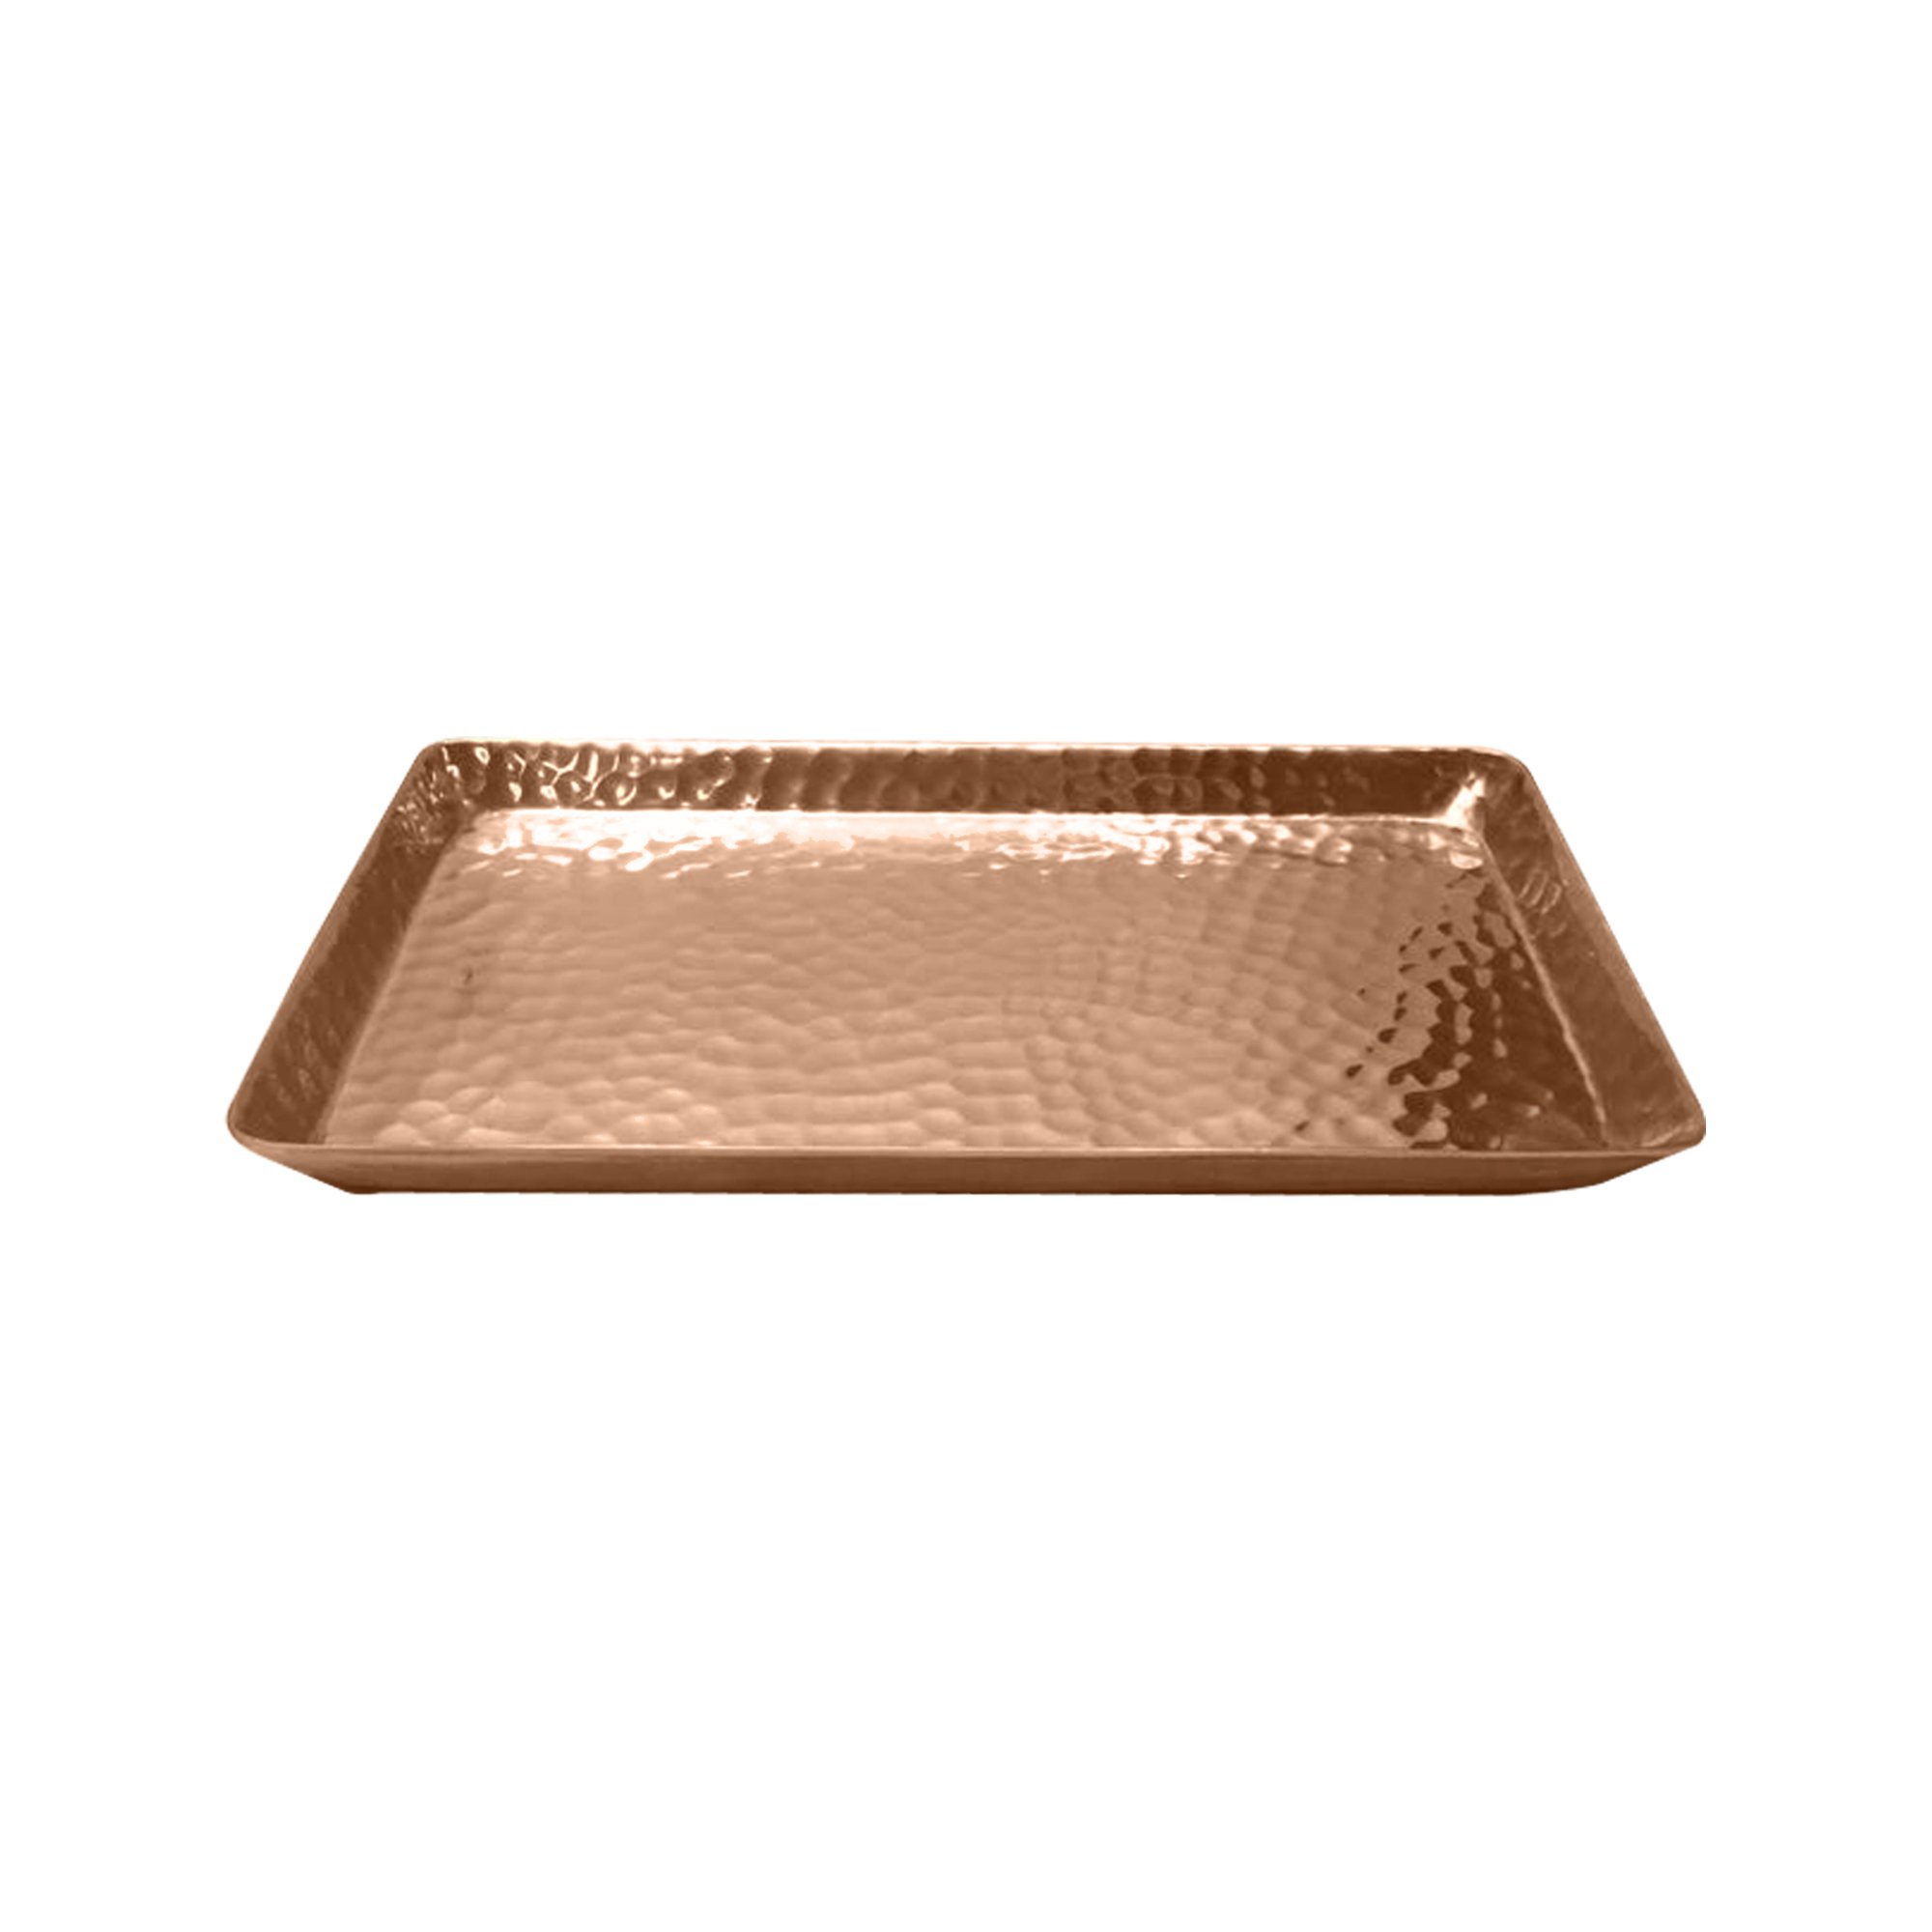 nu steel Copper Hammered Vanity Tray